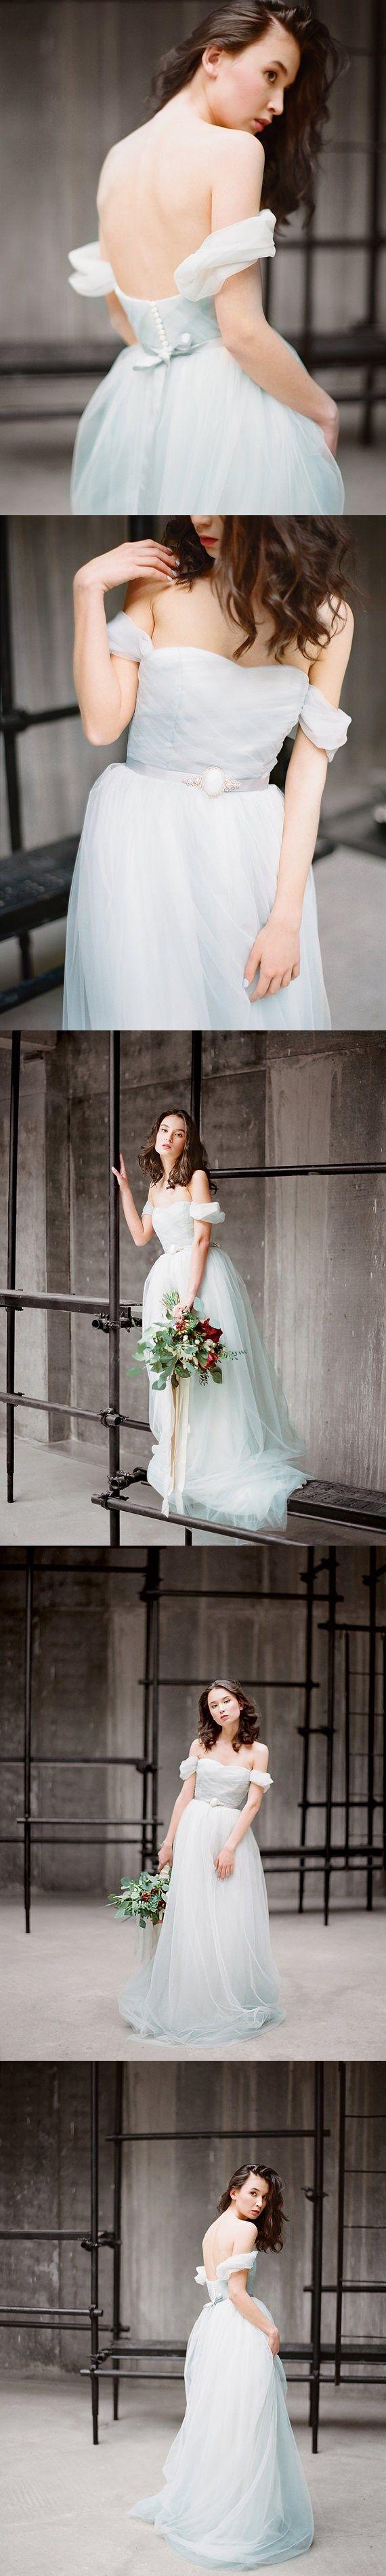 Cheap wedding dresses offtheshoulder short train ruffles simple